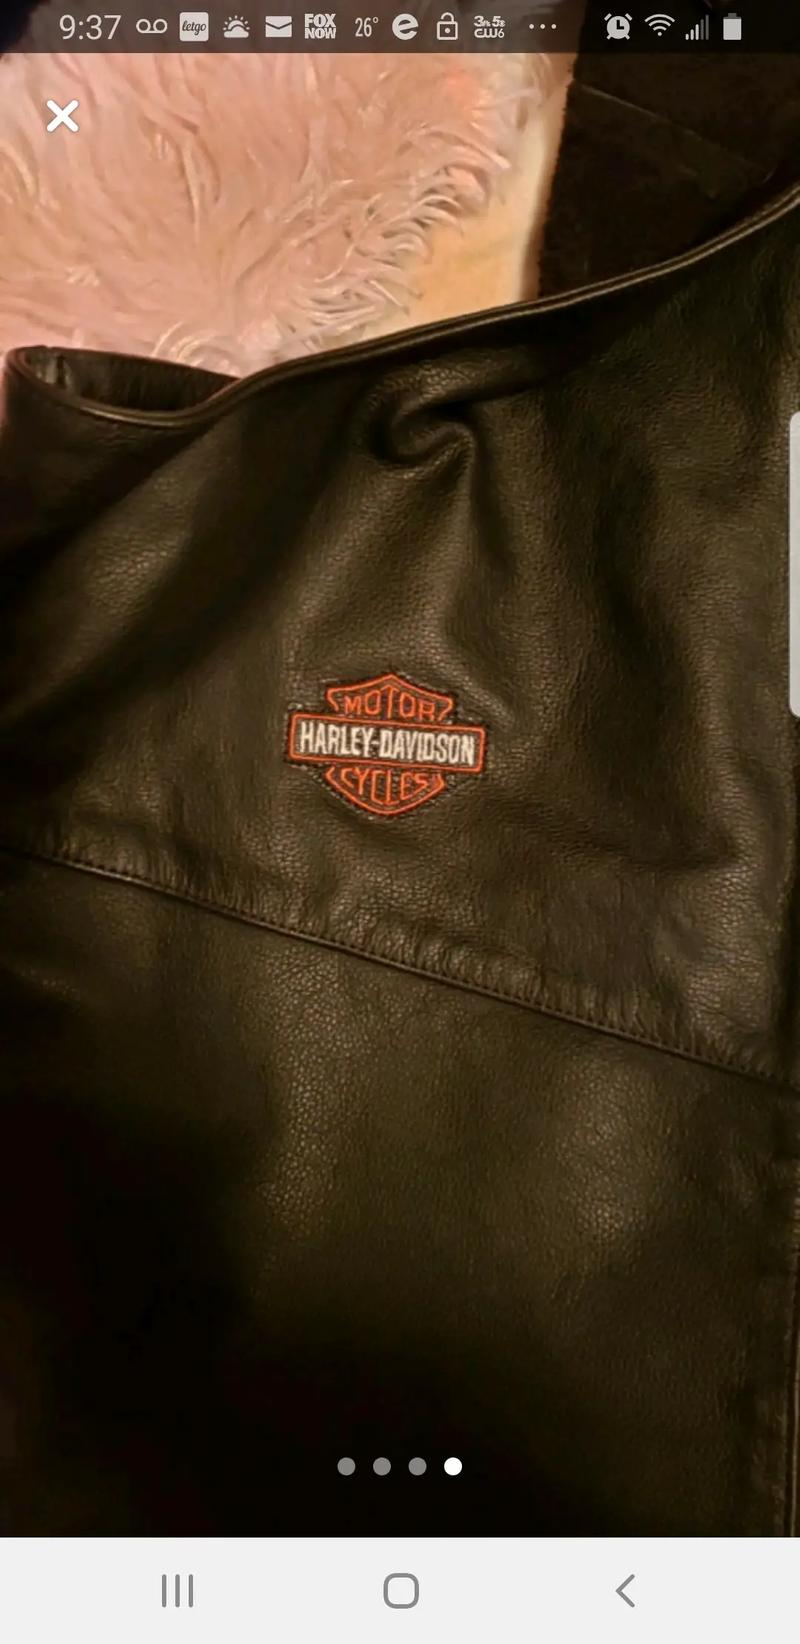 Photo XL Leather Harley Davidson Chaps Never worn !!